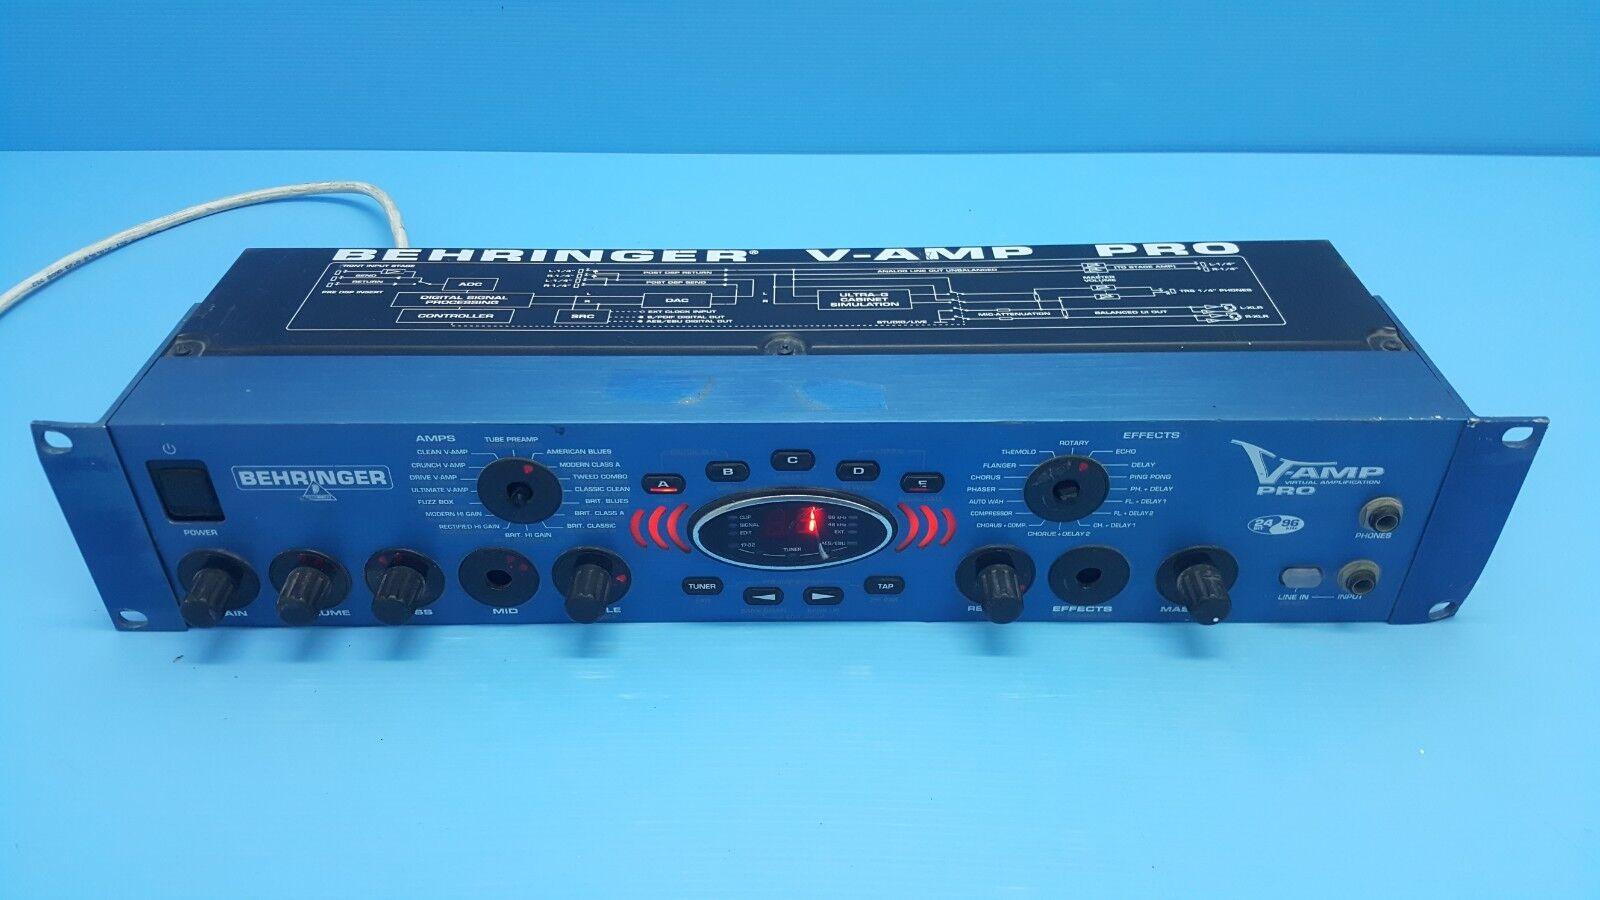 Behringer V-AMP LX1 PRO Virtual Amplification and Effects 24 Bit 96 kHz